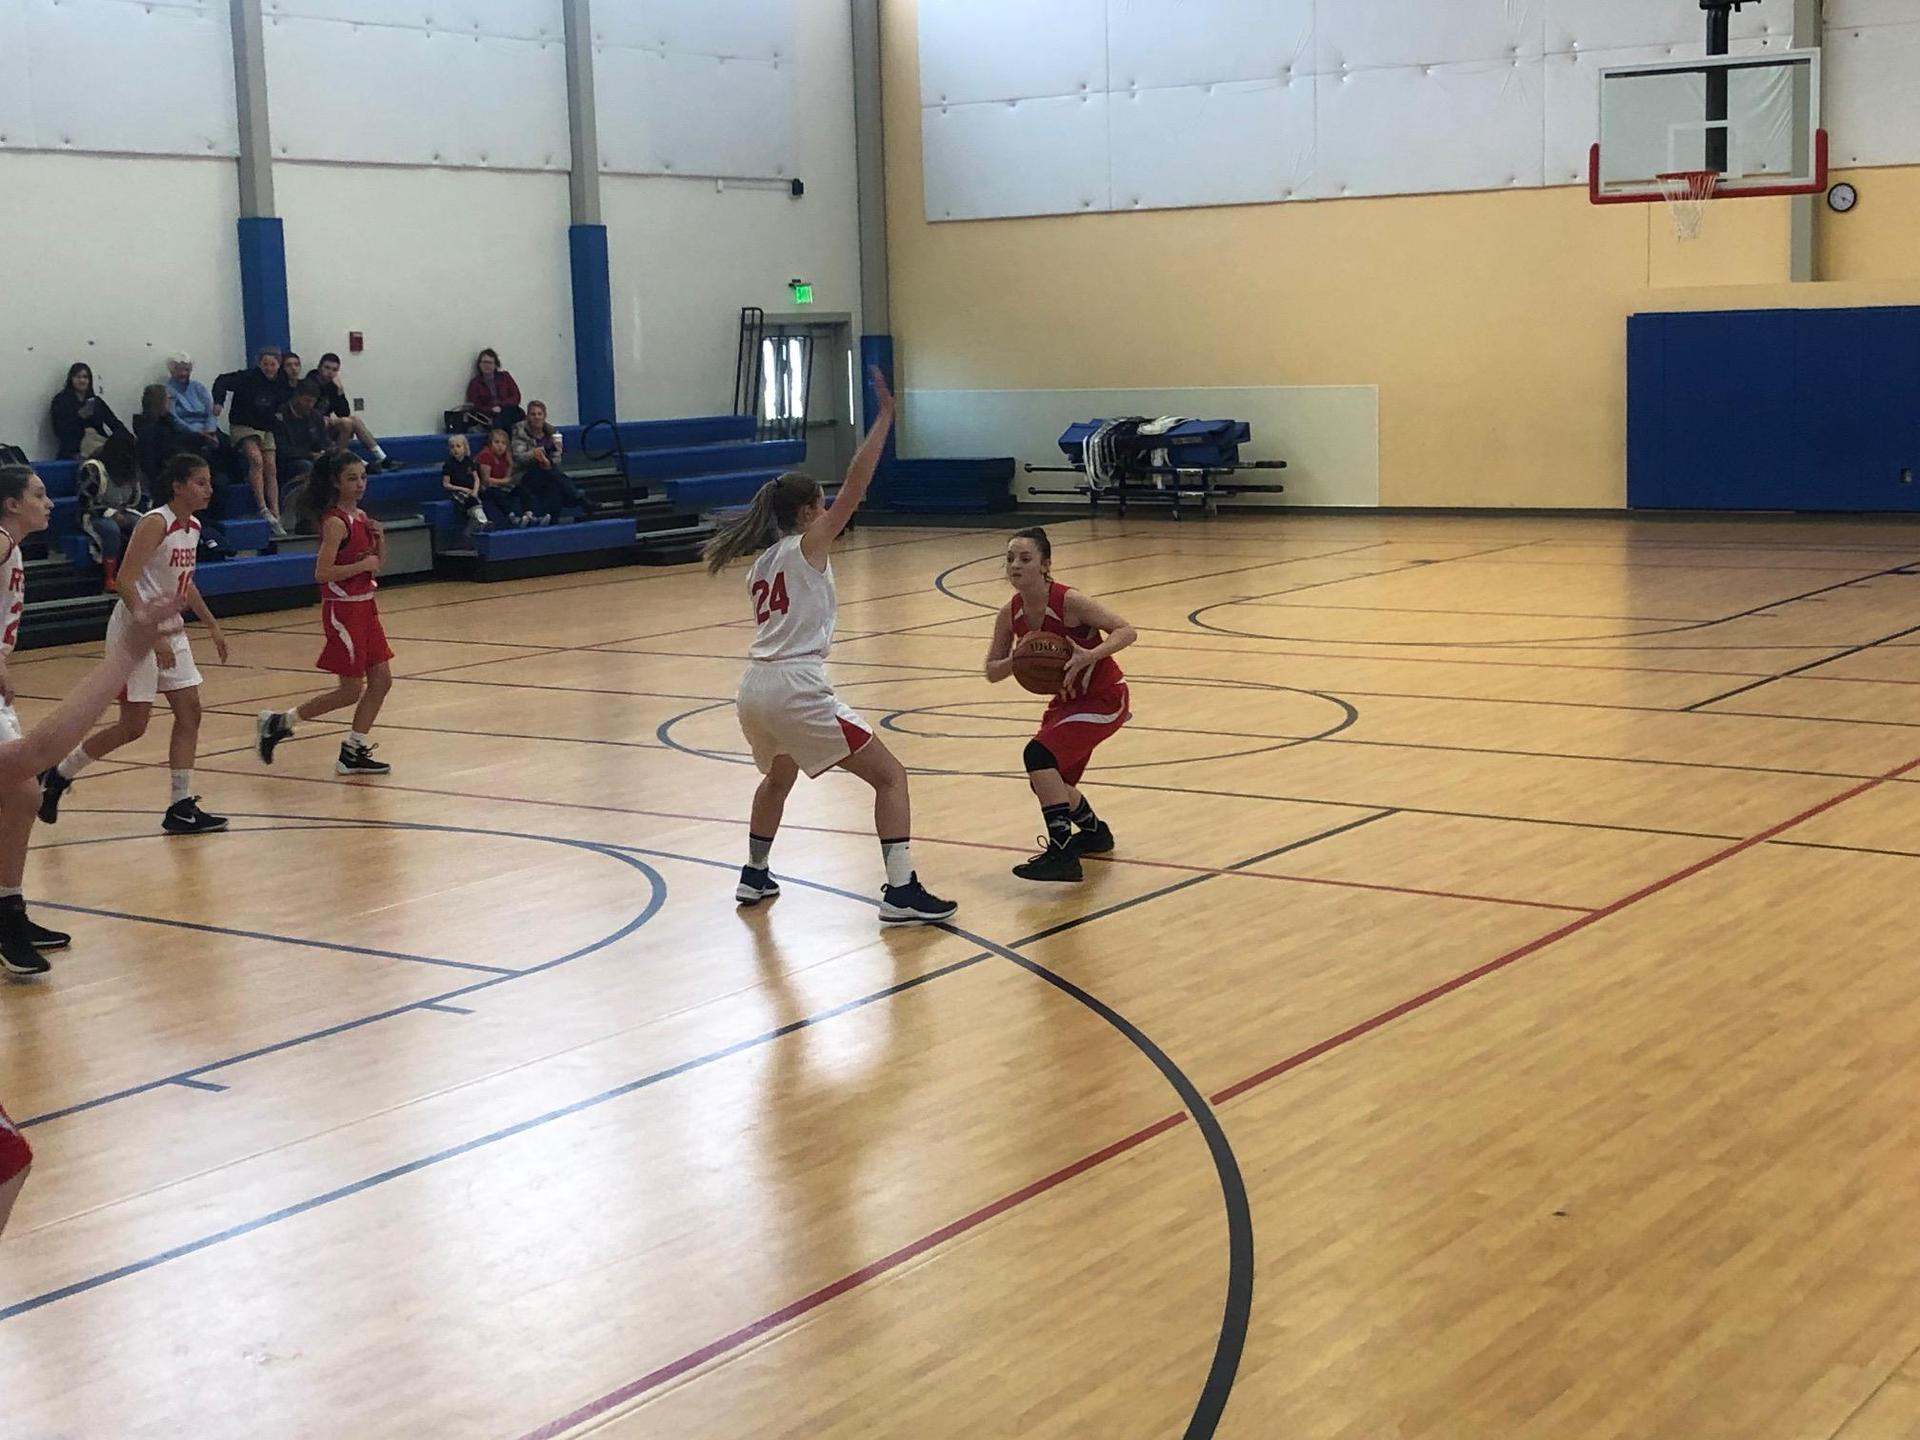 Girls basketball player playing defense